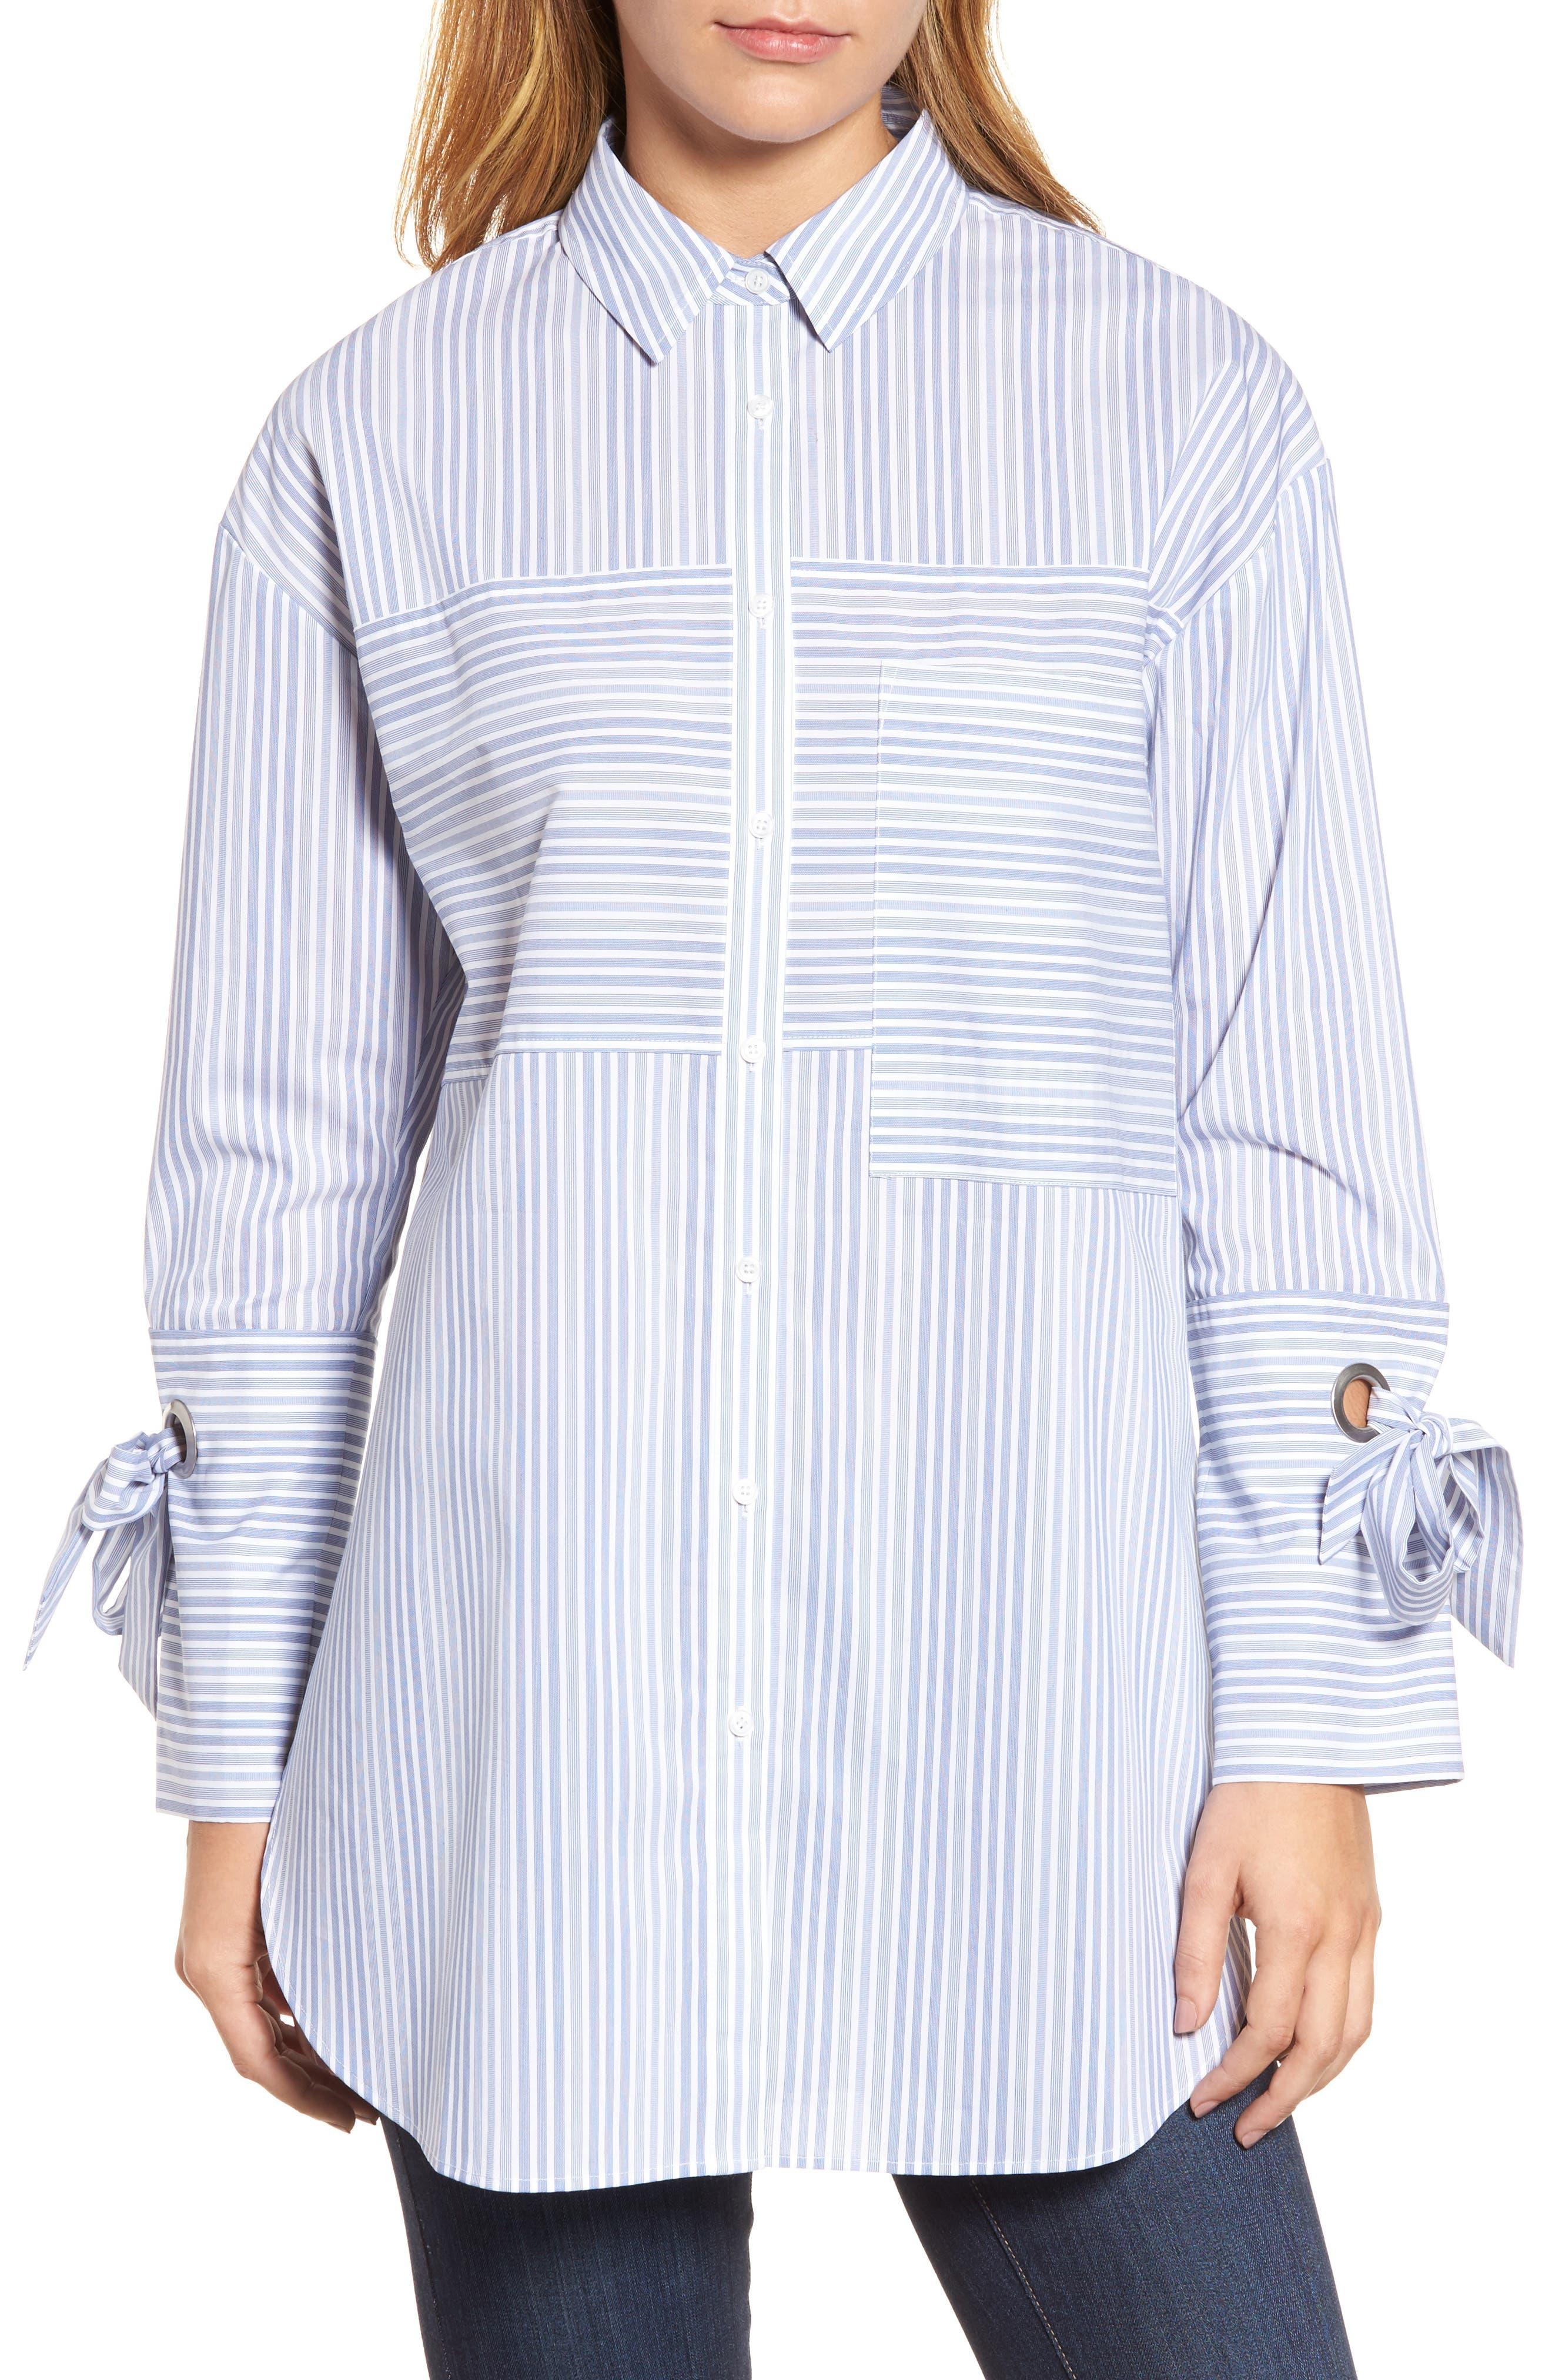 Pocket Detail Stripe Tunic Top,                             Main thumbnail 1, color,                             Blue- White Stripe